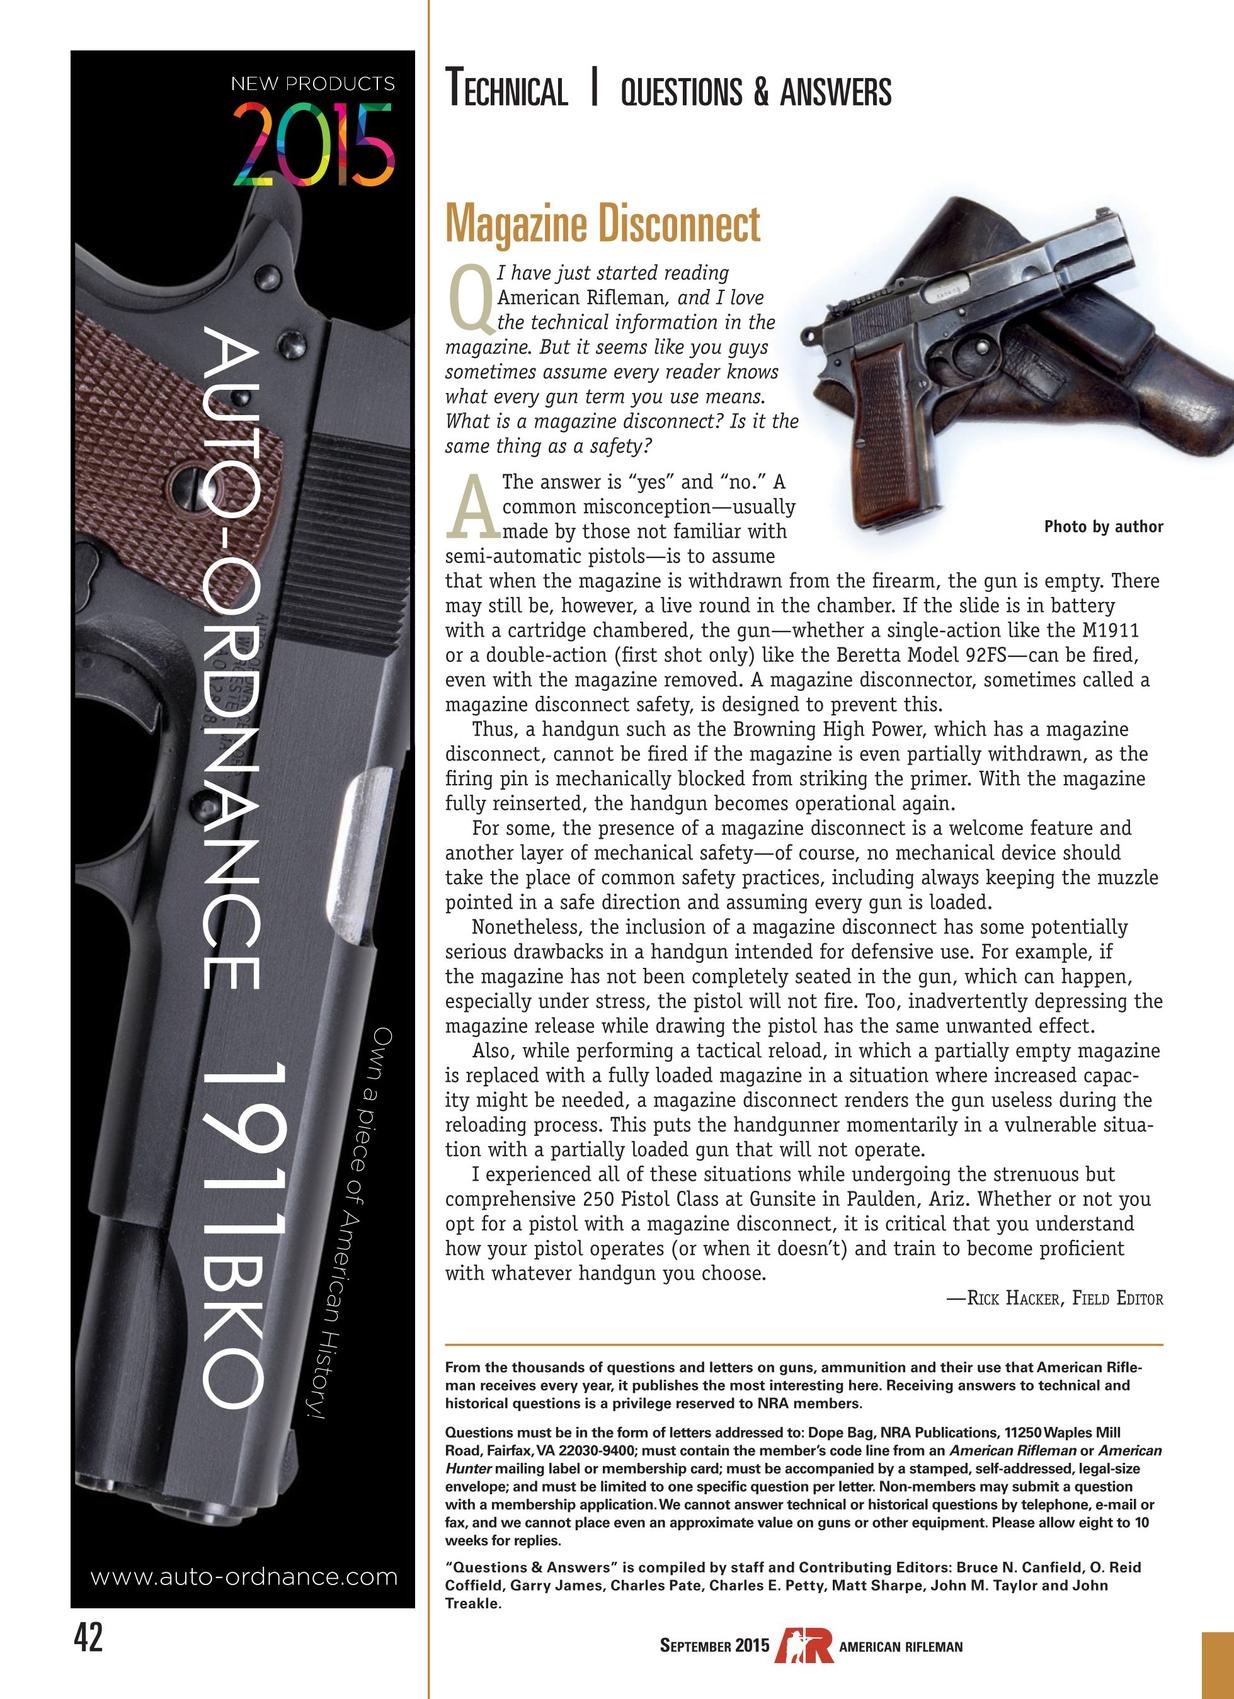 American Rifleman - September 2015